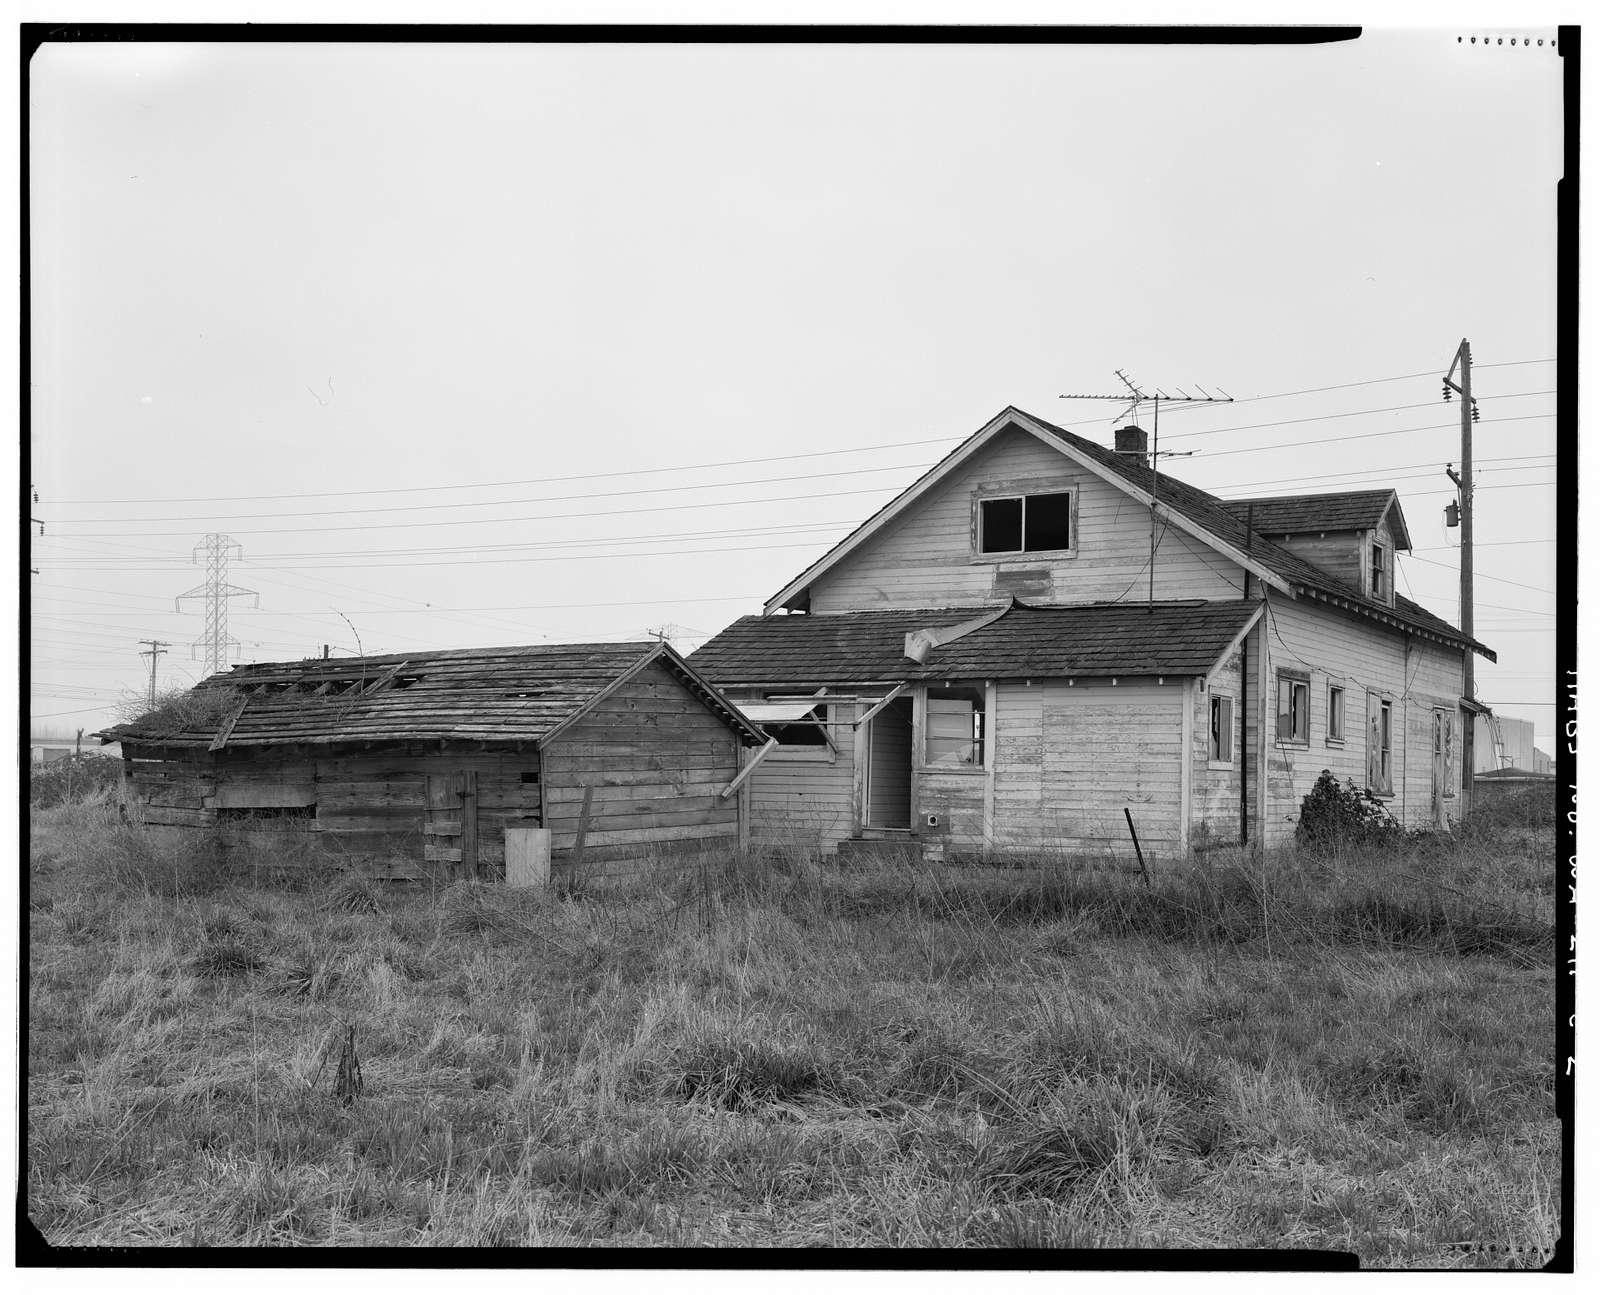 Kosai Farm, Farmhouse Shed, B Street north of Northwest Twenty-ninth Street, Auburn, King County, WA